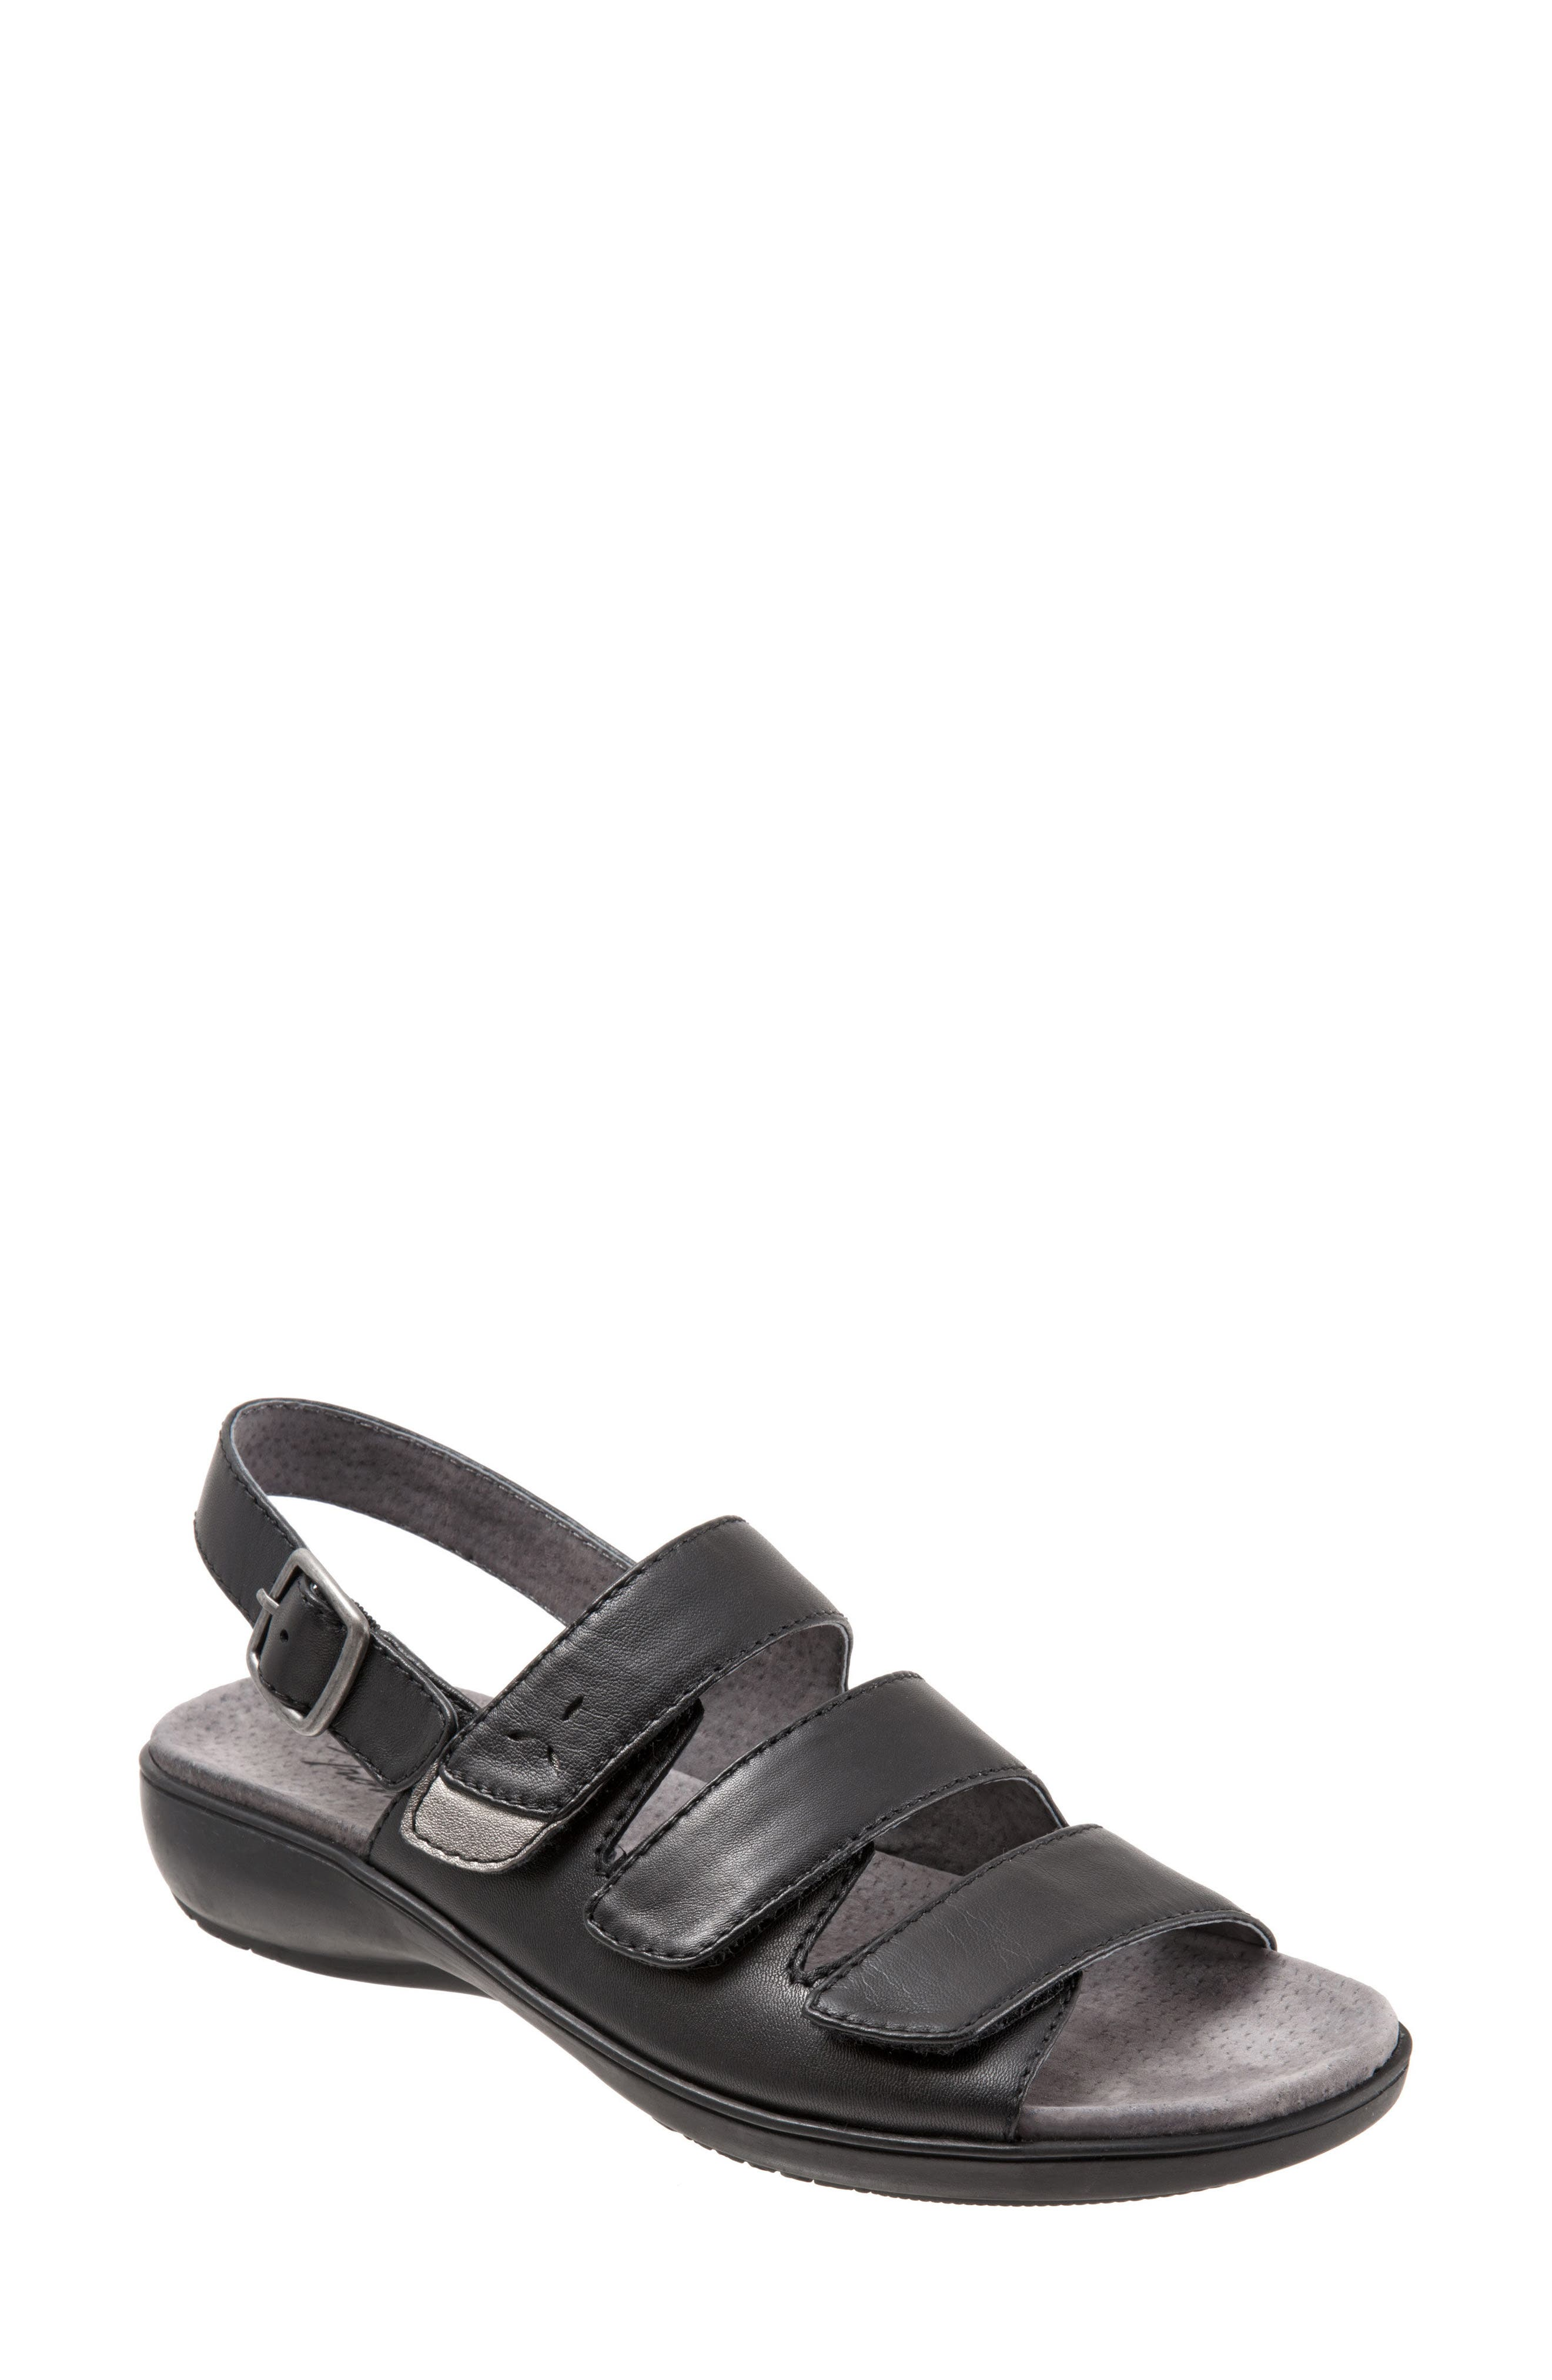 Alternate Image 1 Selected - Trotters Kendra Strappy Slingback Sandal (Women)